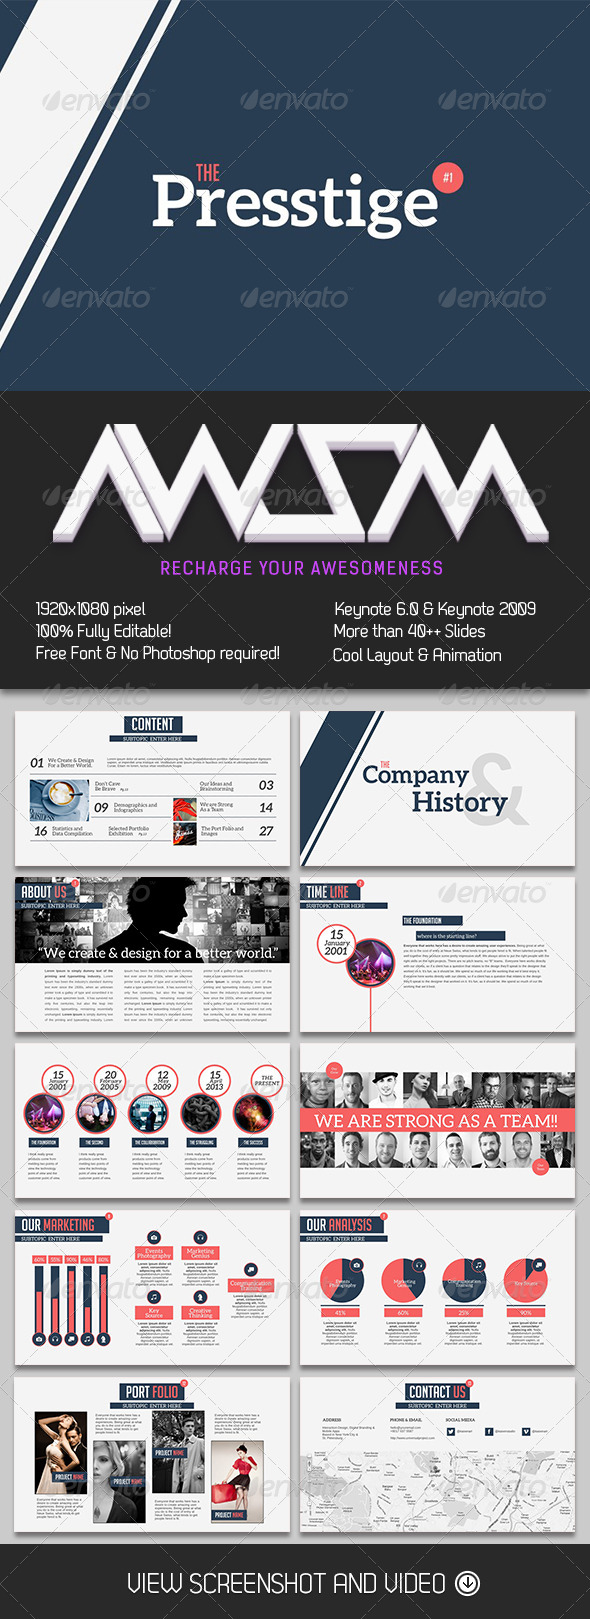 GraphicRiver Presstige Keynote Template 6802329